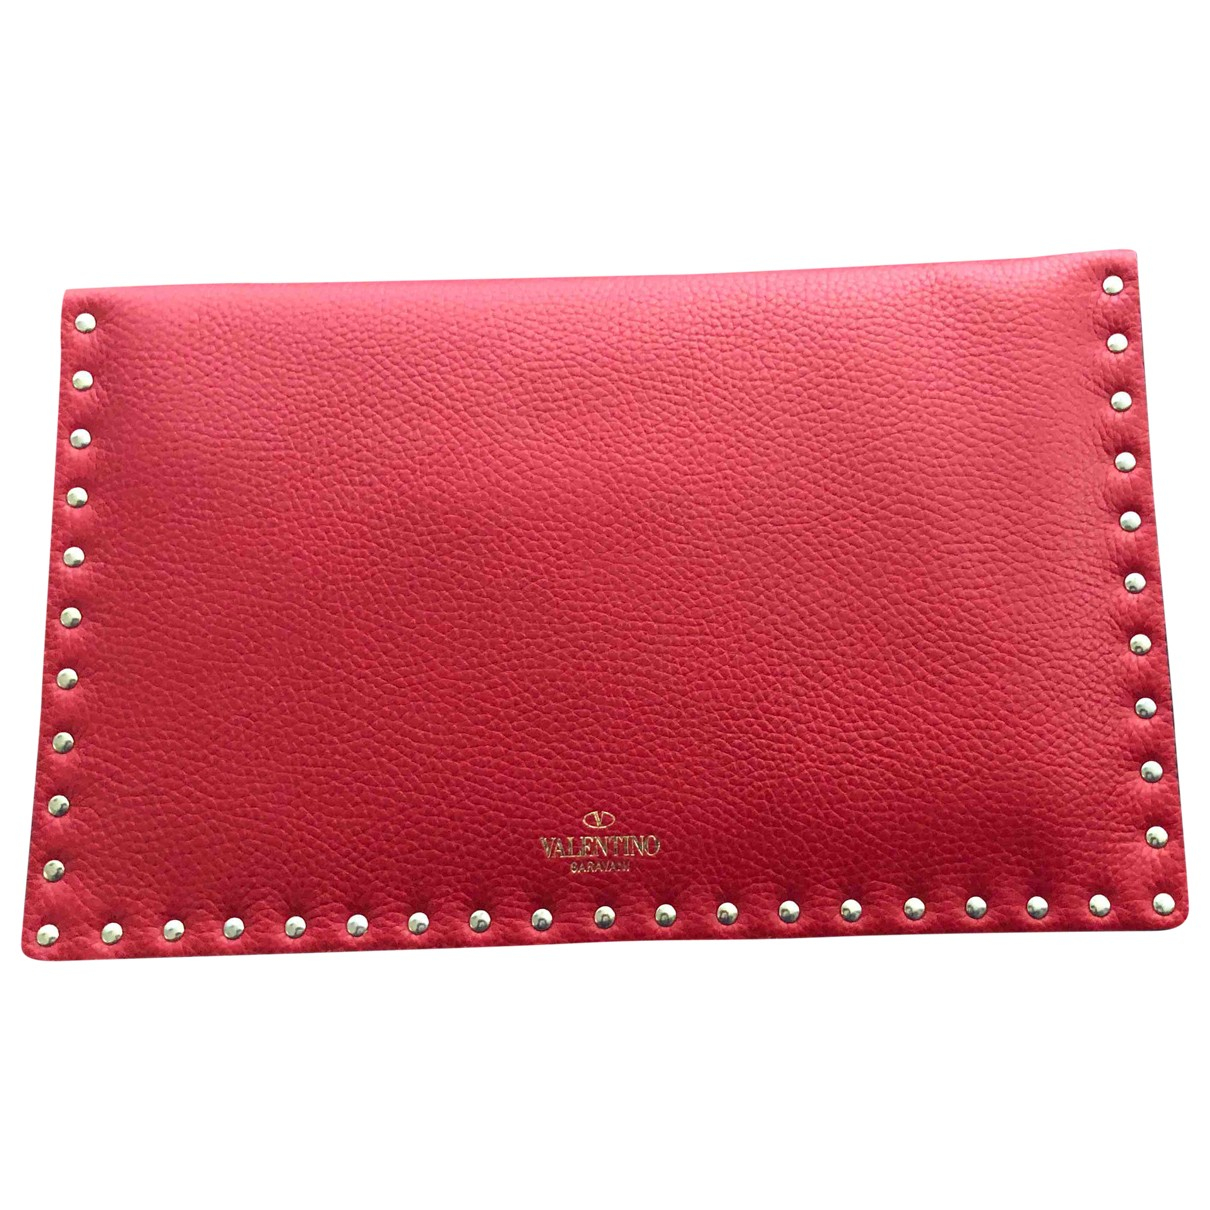 Valentino Garavani My Rockstud Clutch in  Rot Leder